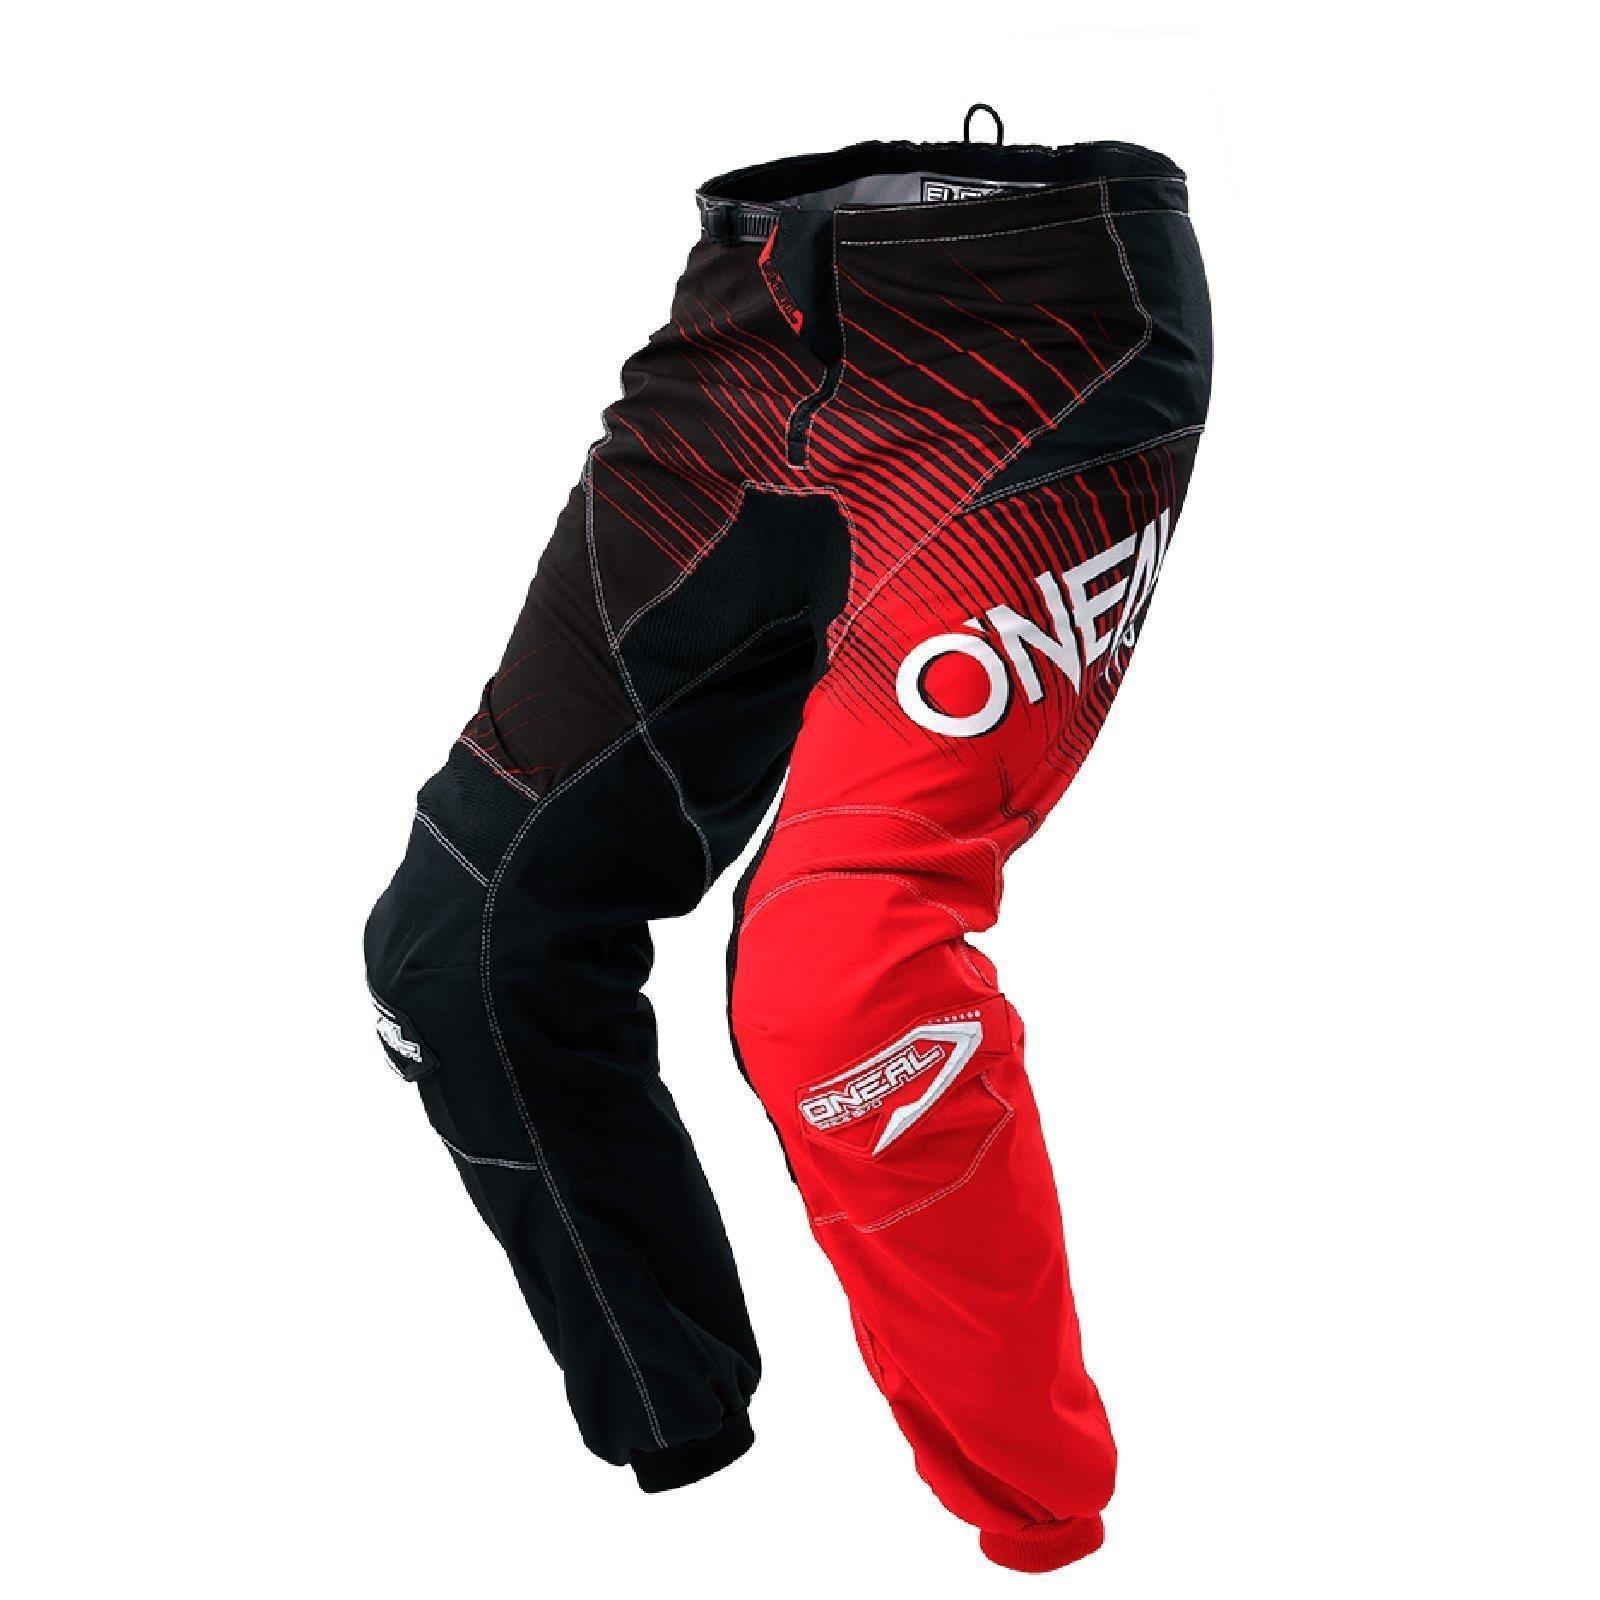 Elemento-oNeal-racewear-Jersey-pantalones-a-ninos-adulto-Motocross-Enduro-downhill miniatura 25